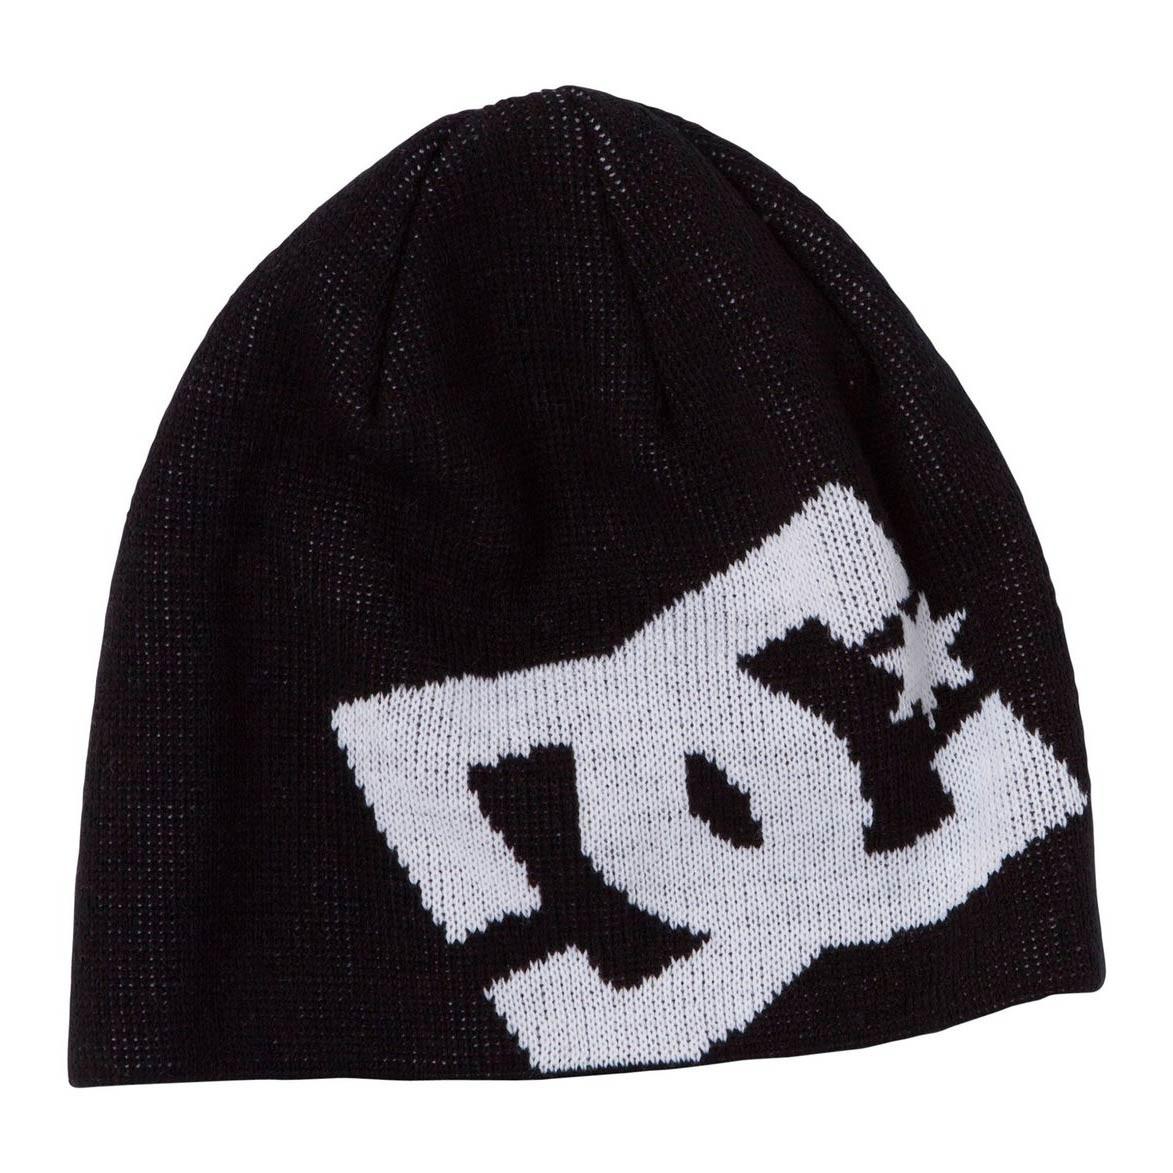 71c7350a7 Zimná čiapka DC Big Star black | Snowboard Zezula